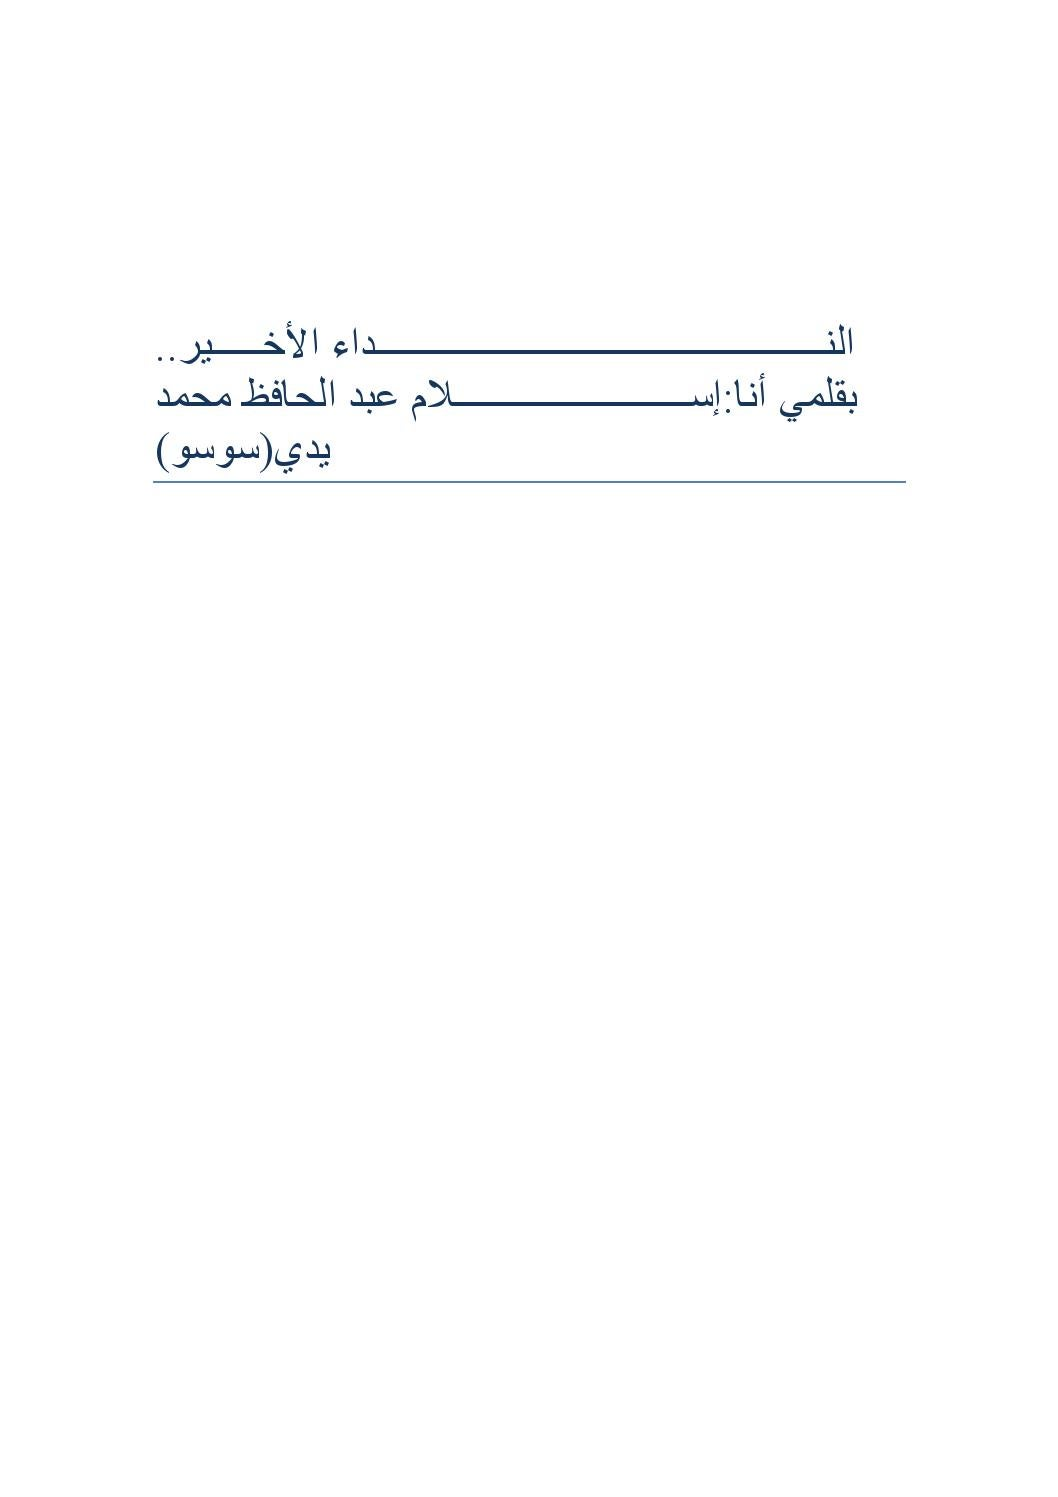 fd91bb5231fd5 النداء الاخير by sosa - issuu